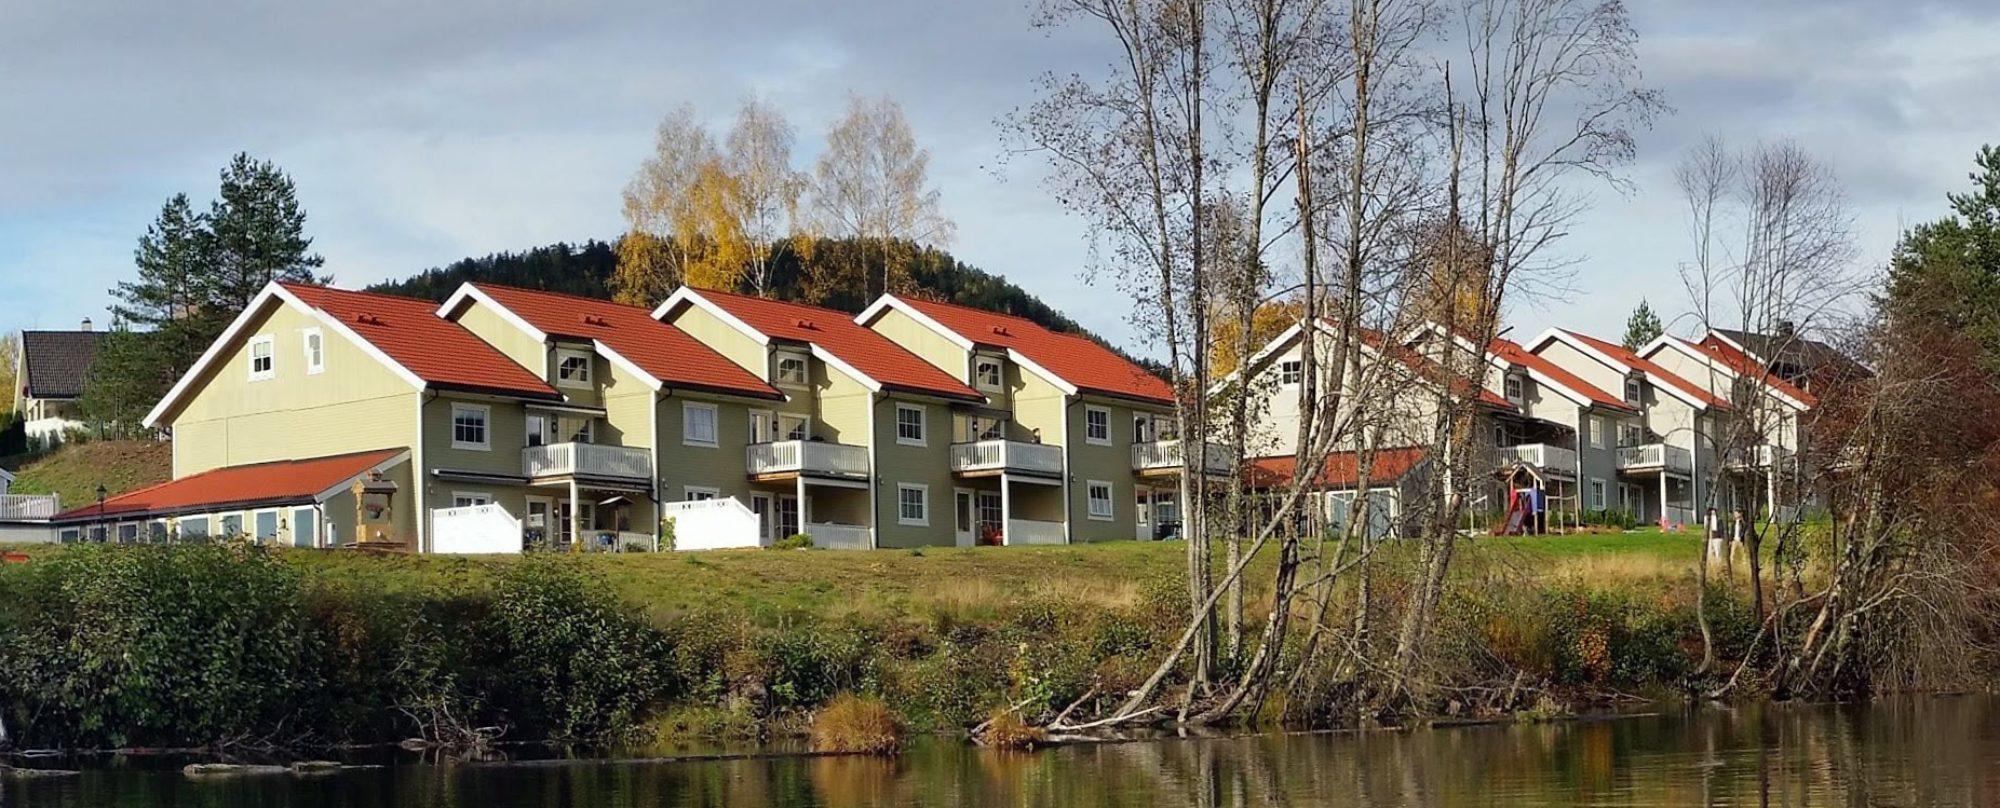 Villa sol og varme kongsberg